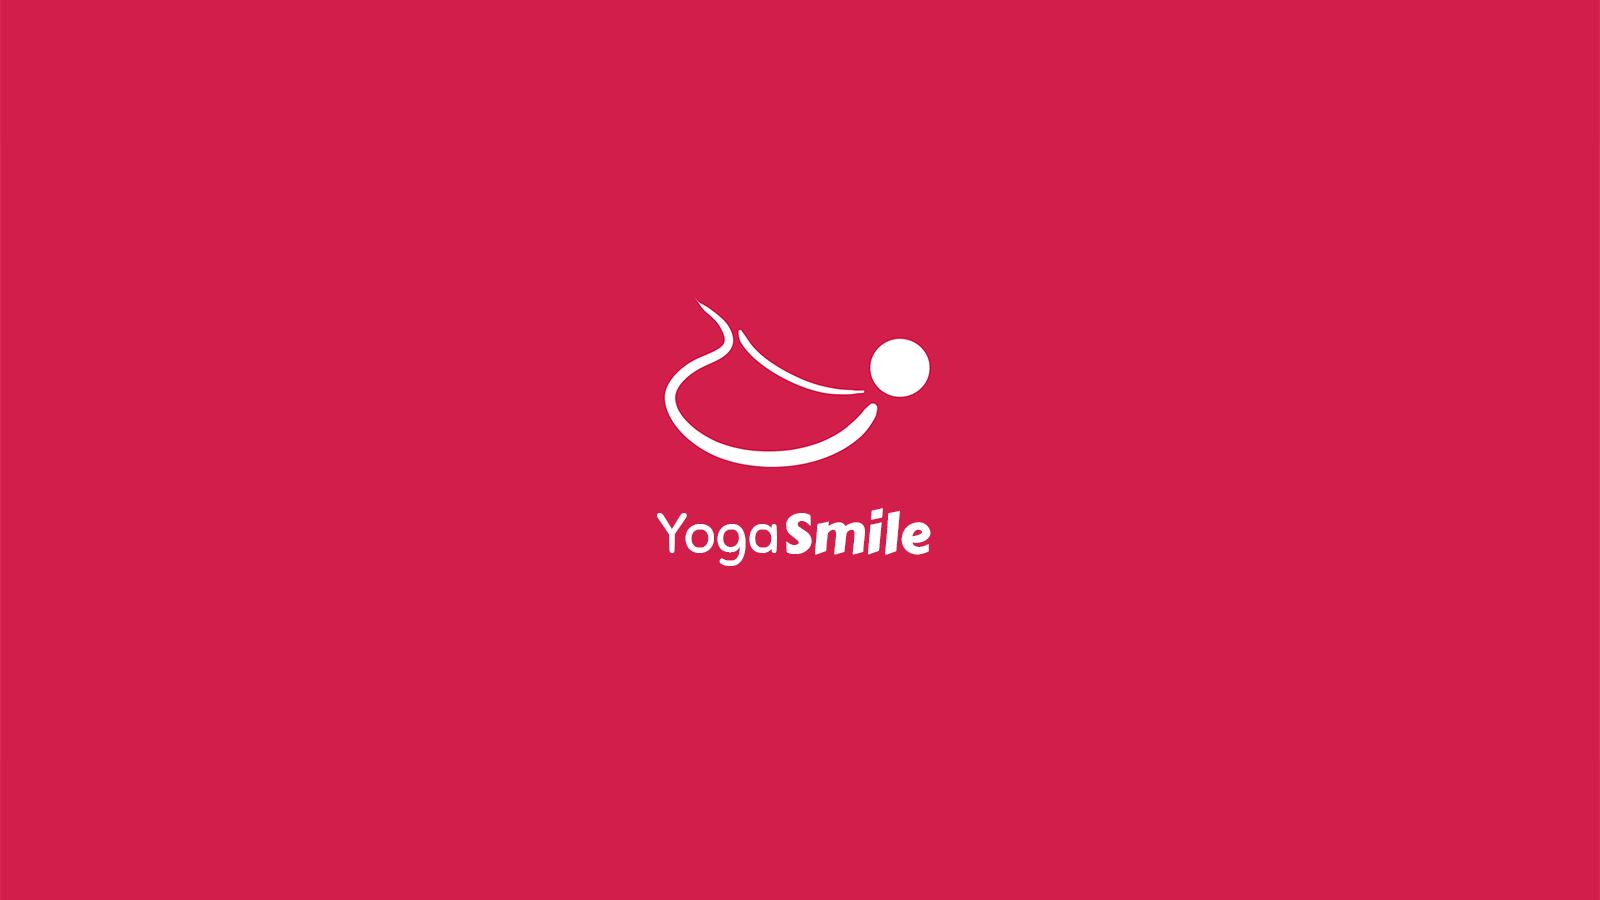 Logo design for yoga studio עיצוב לוגו סטודיו ליוגה